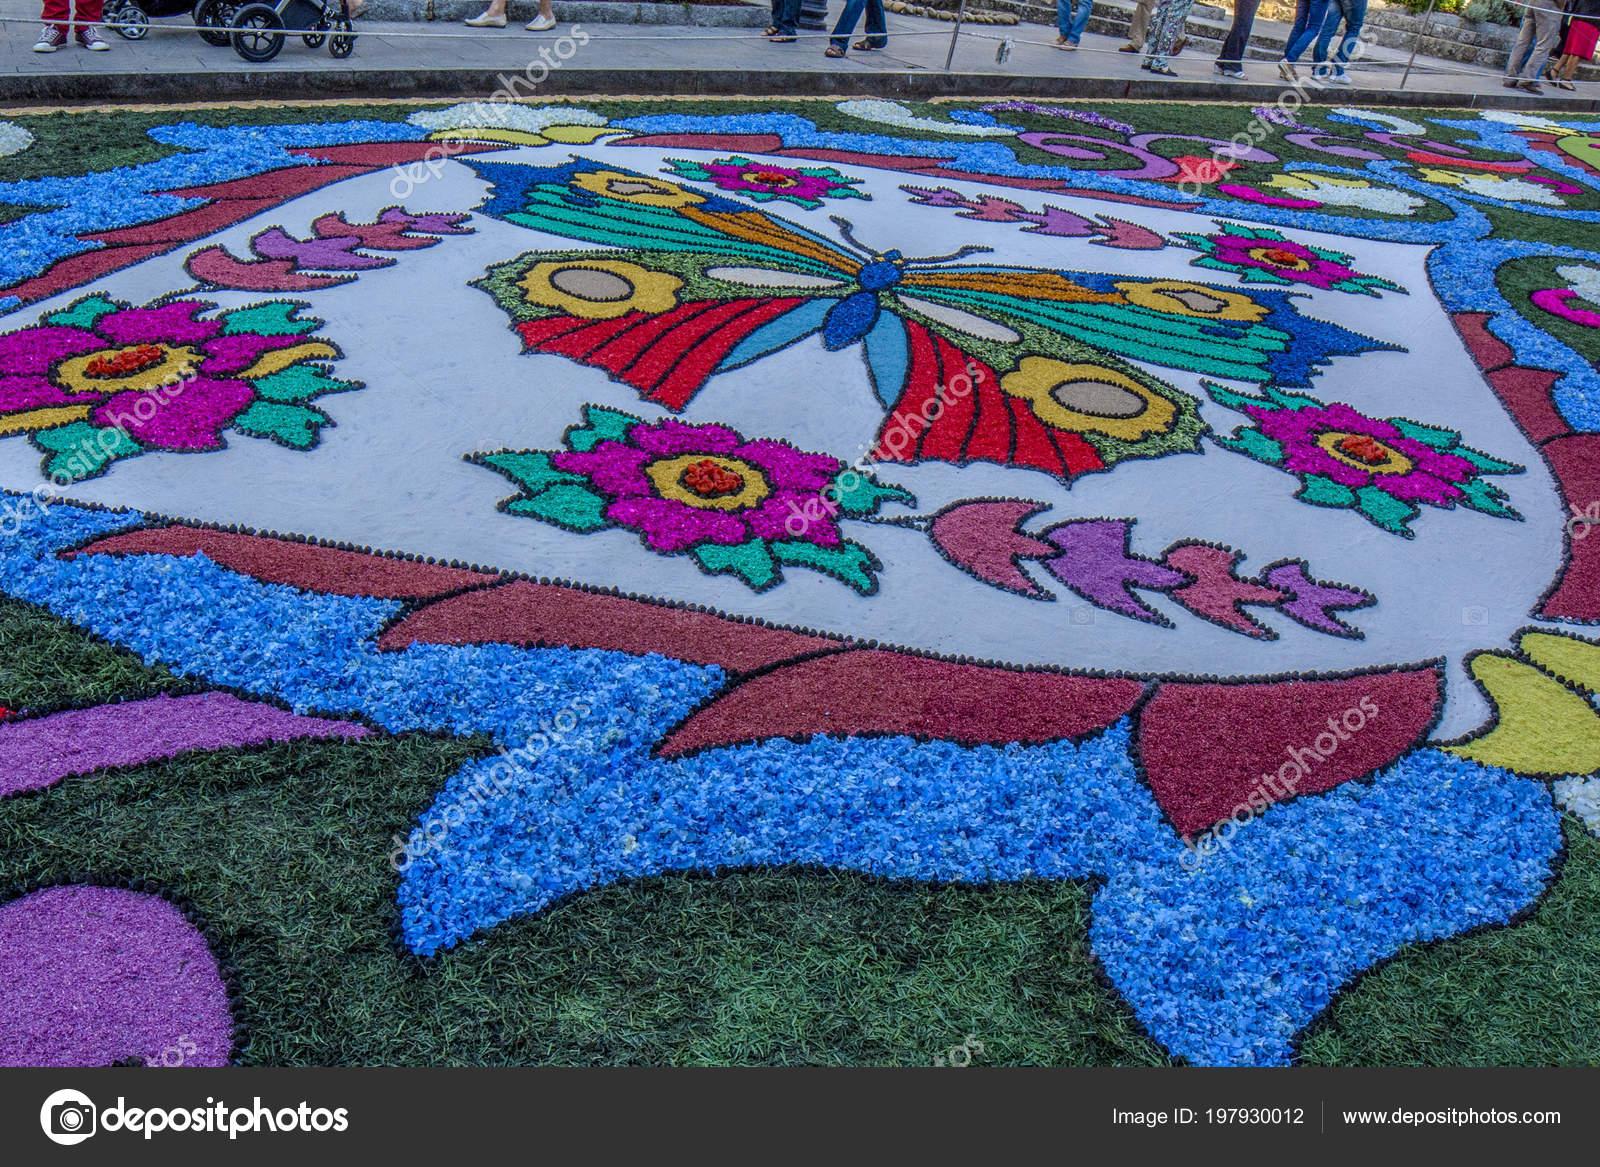 Alfombra Pétalos Flores Para Celebración Corpus Christi Ponteareas